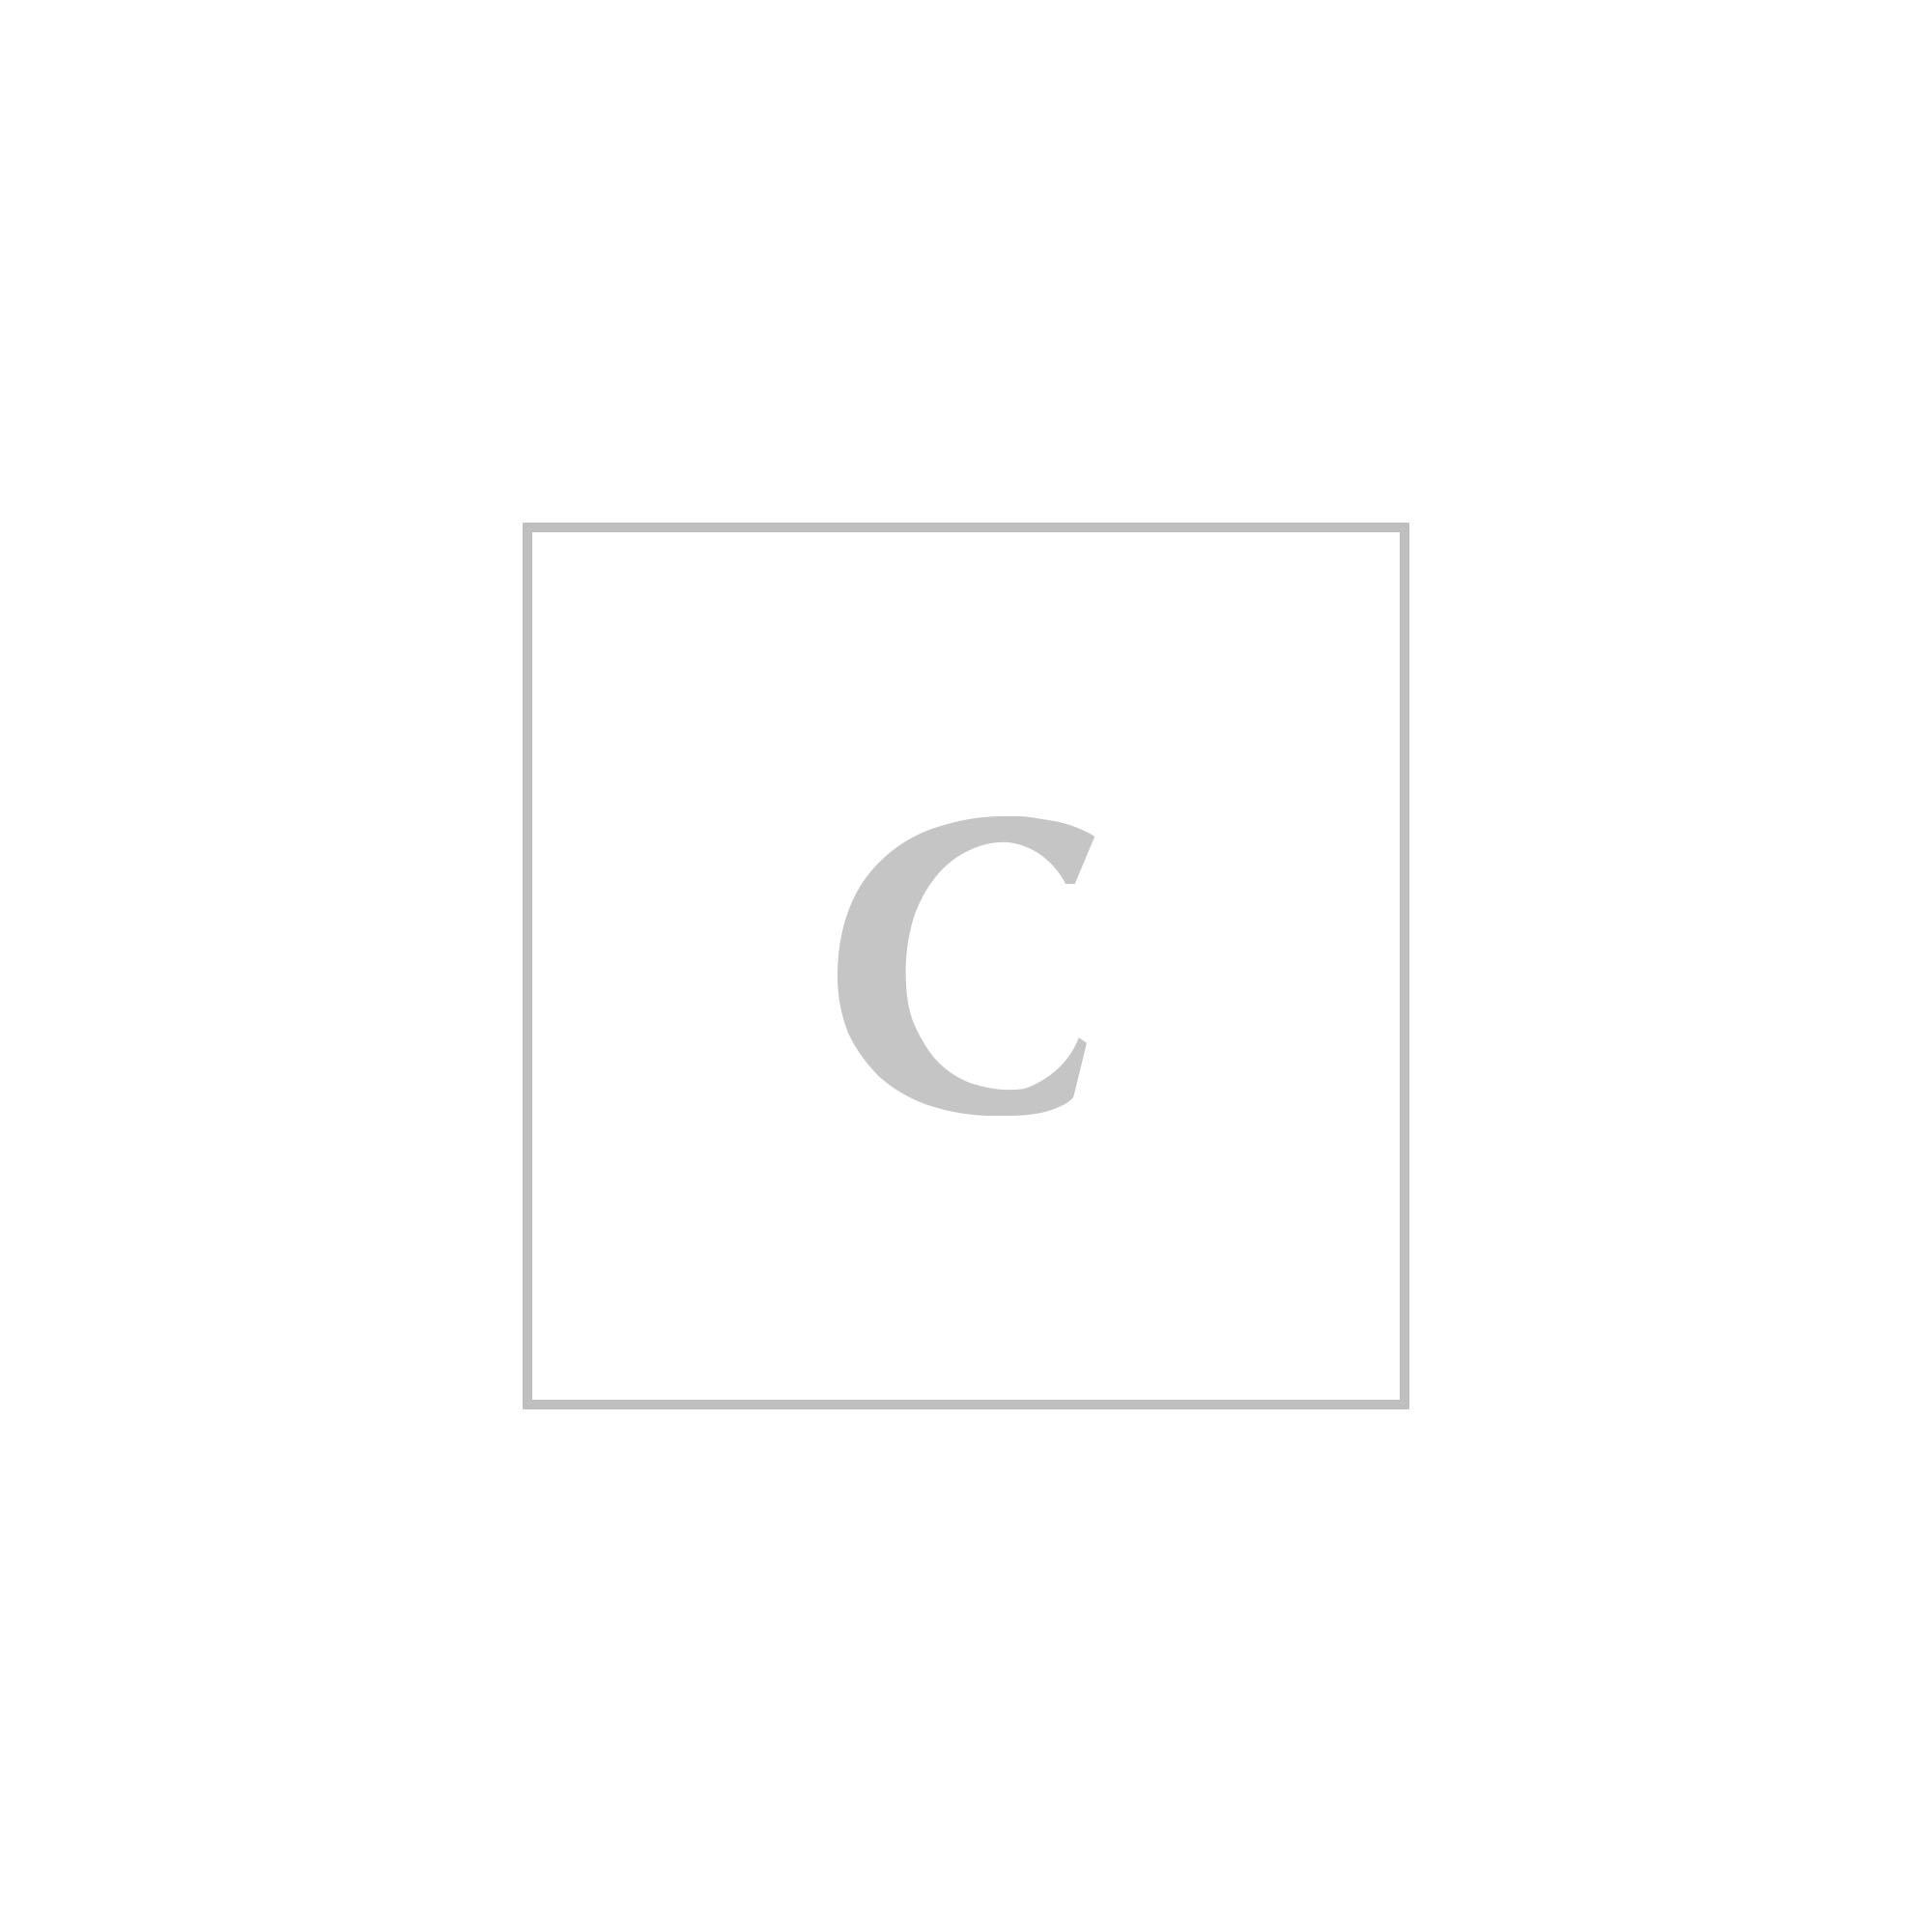 Charlotte olympia calzatura fringed monroe